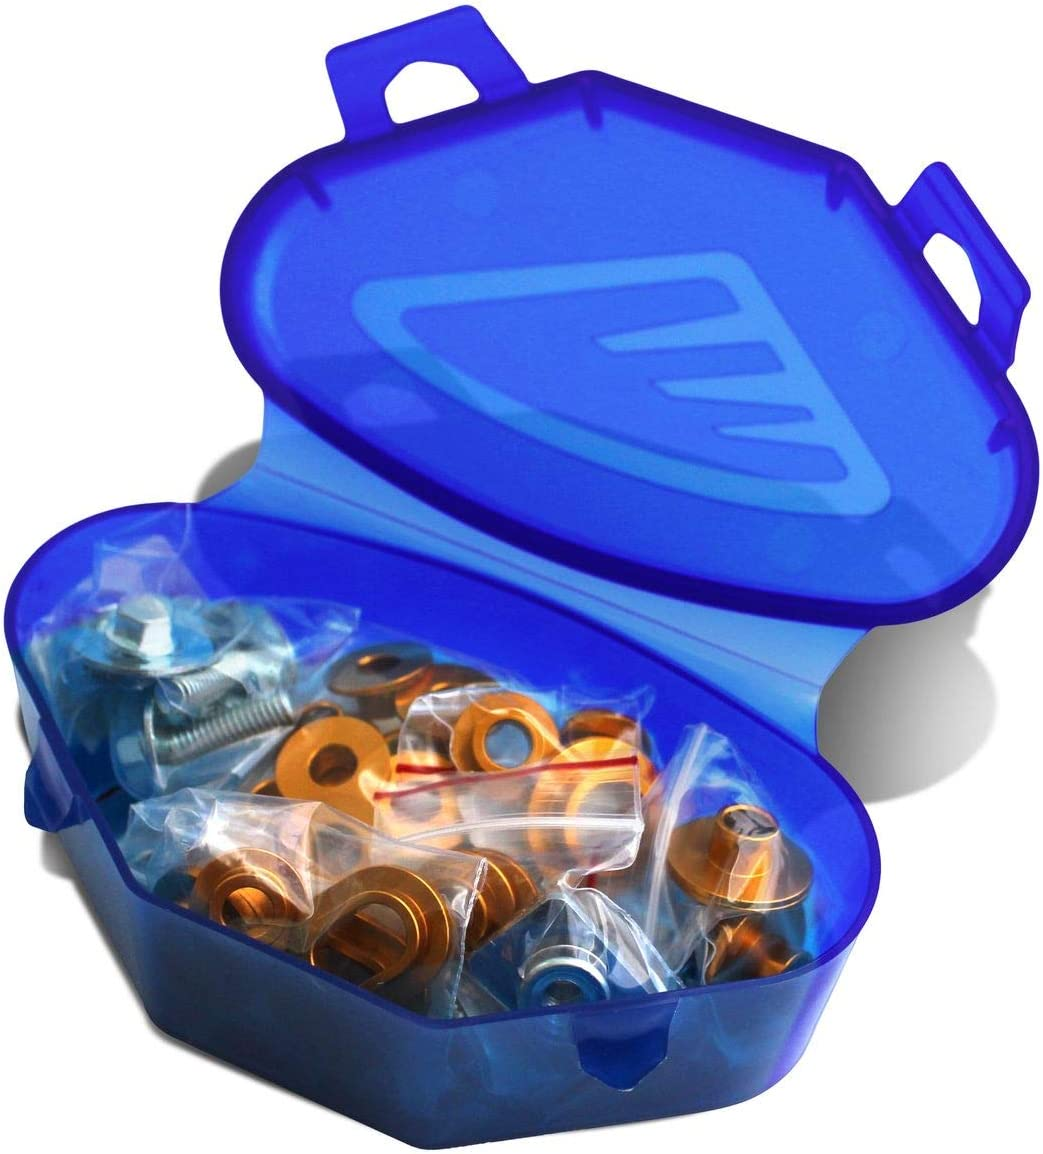 Cycra Body Plastic Fastener Set 04-05 HONDA CRF250R